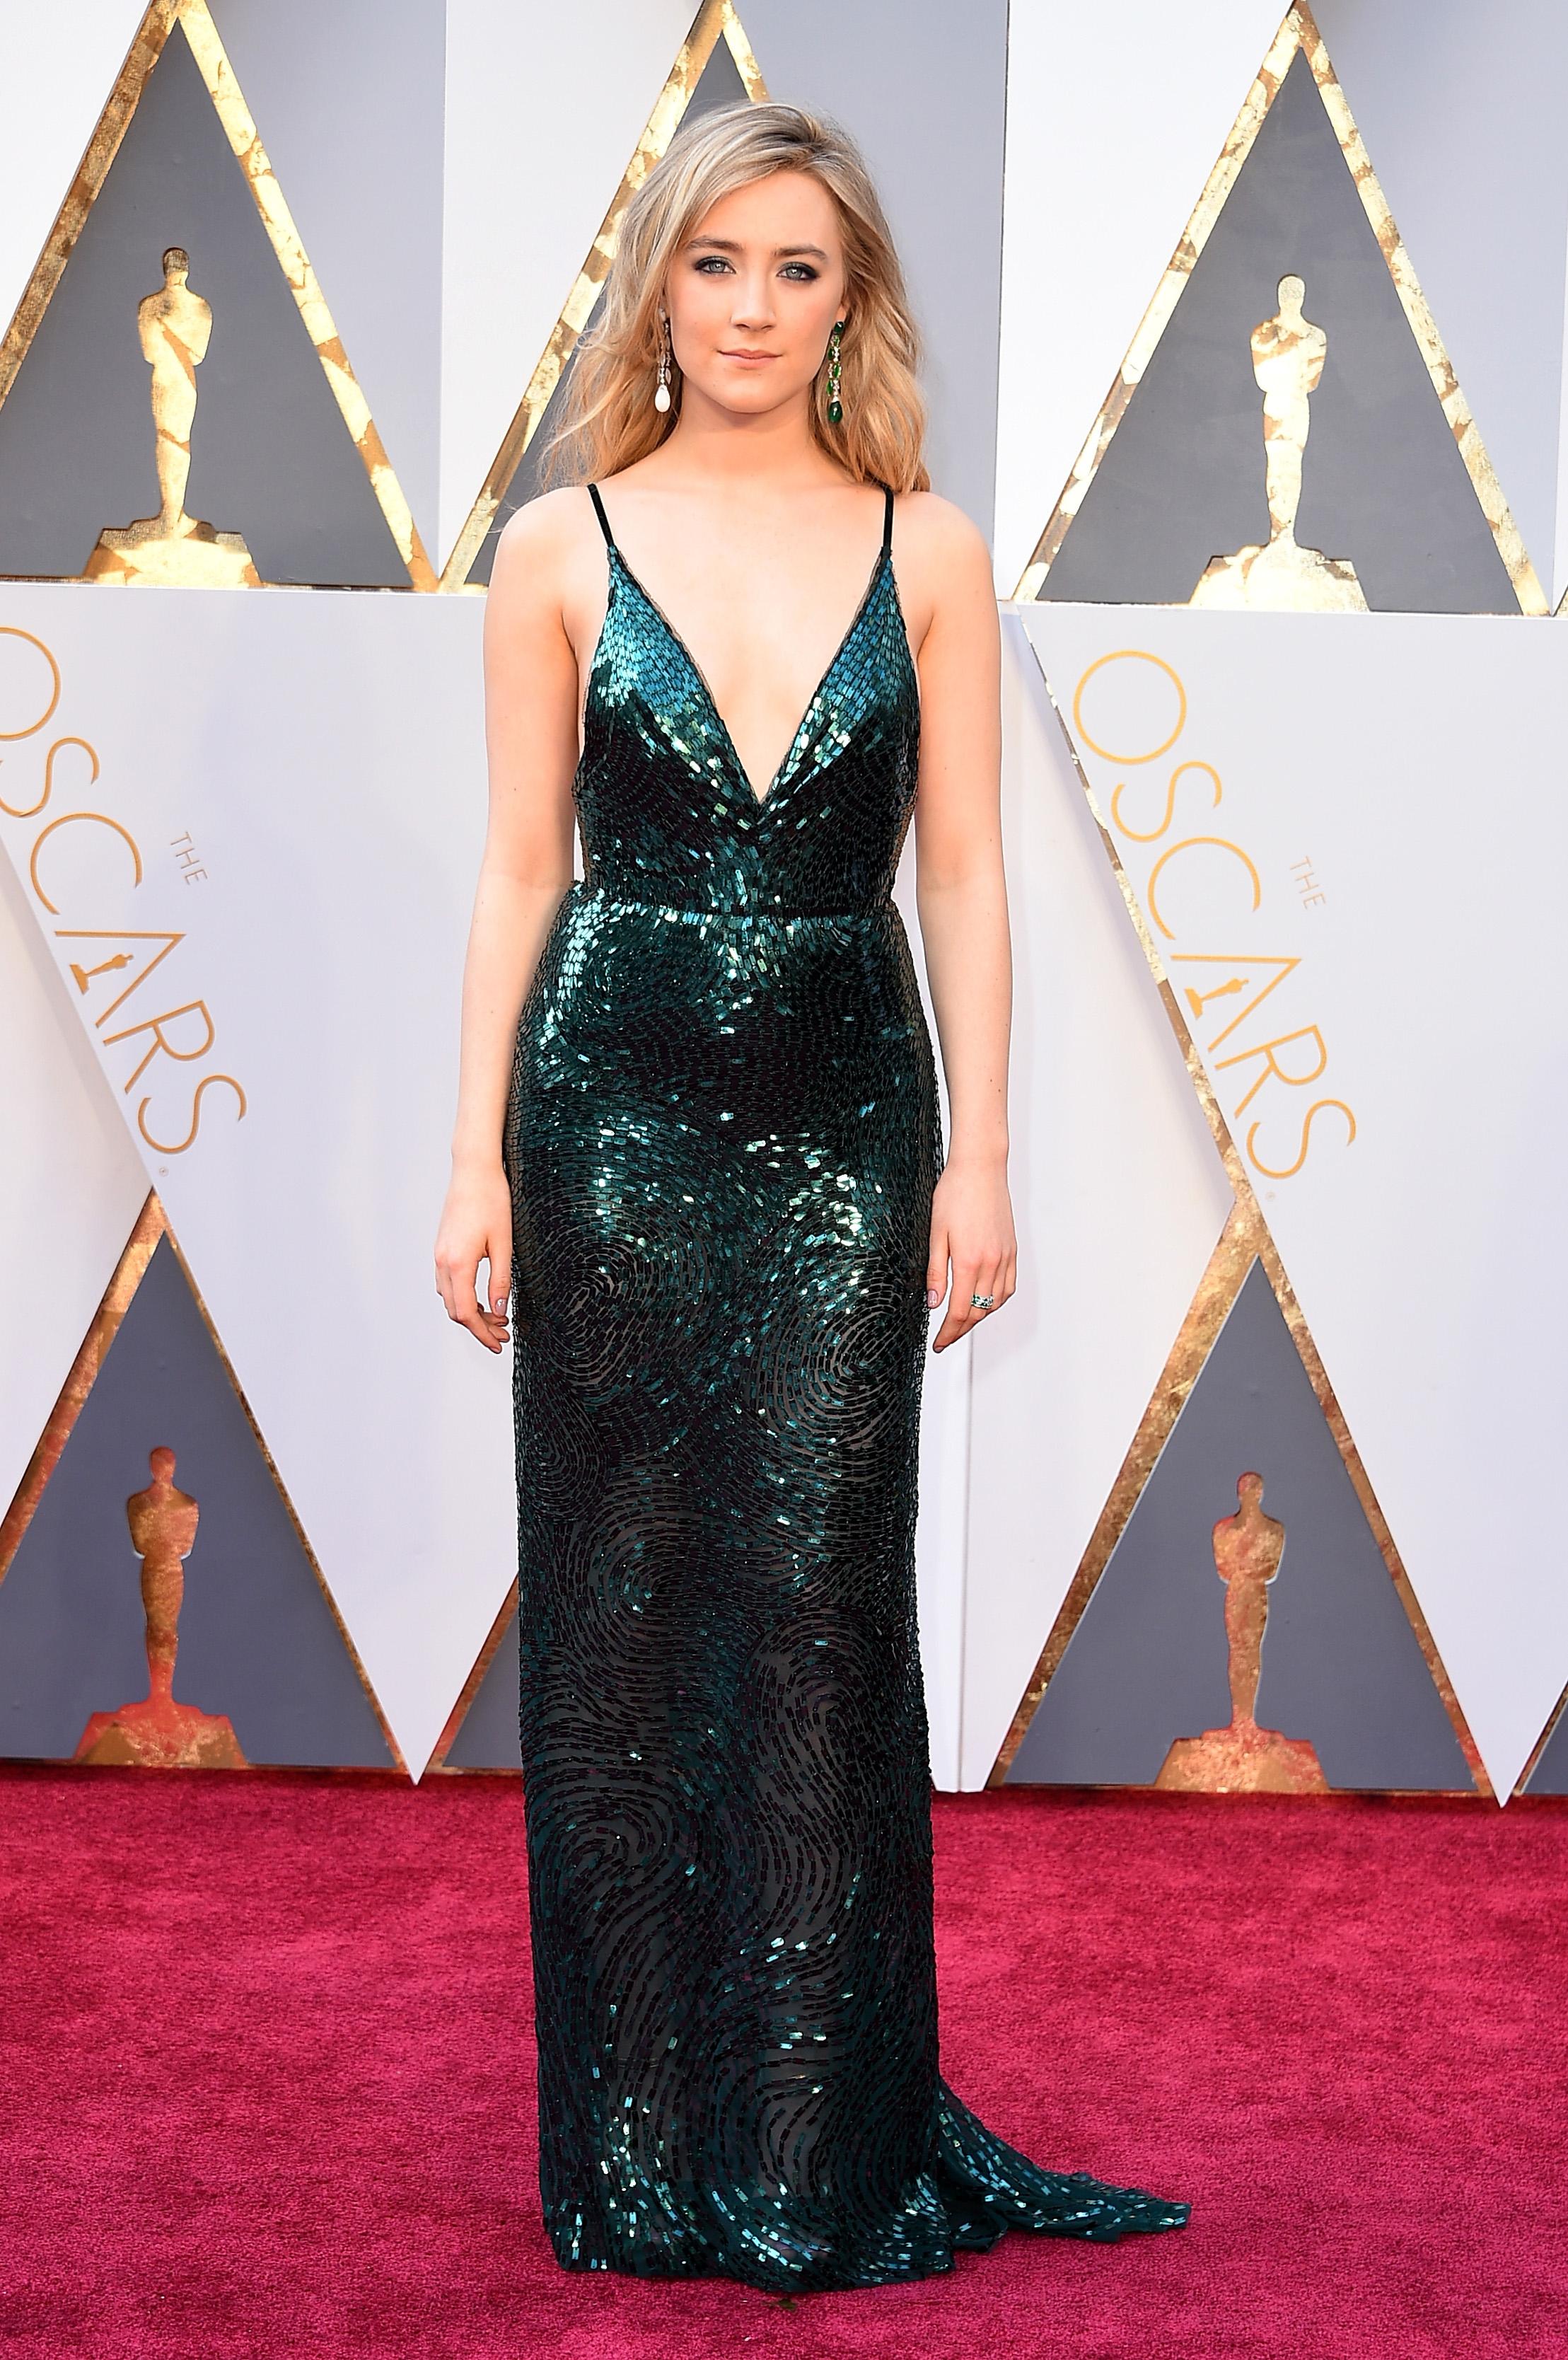 Saoirse Ronan at the 88th Academy Awards.